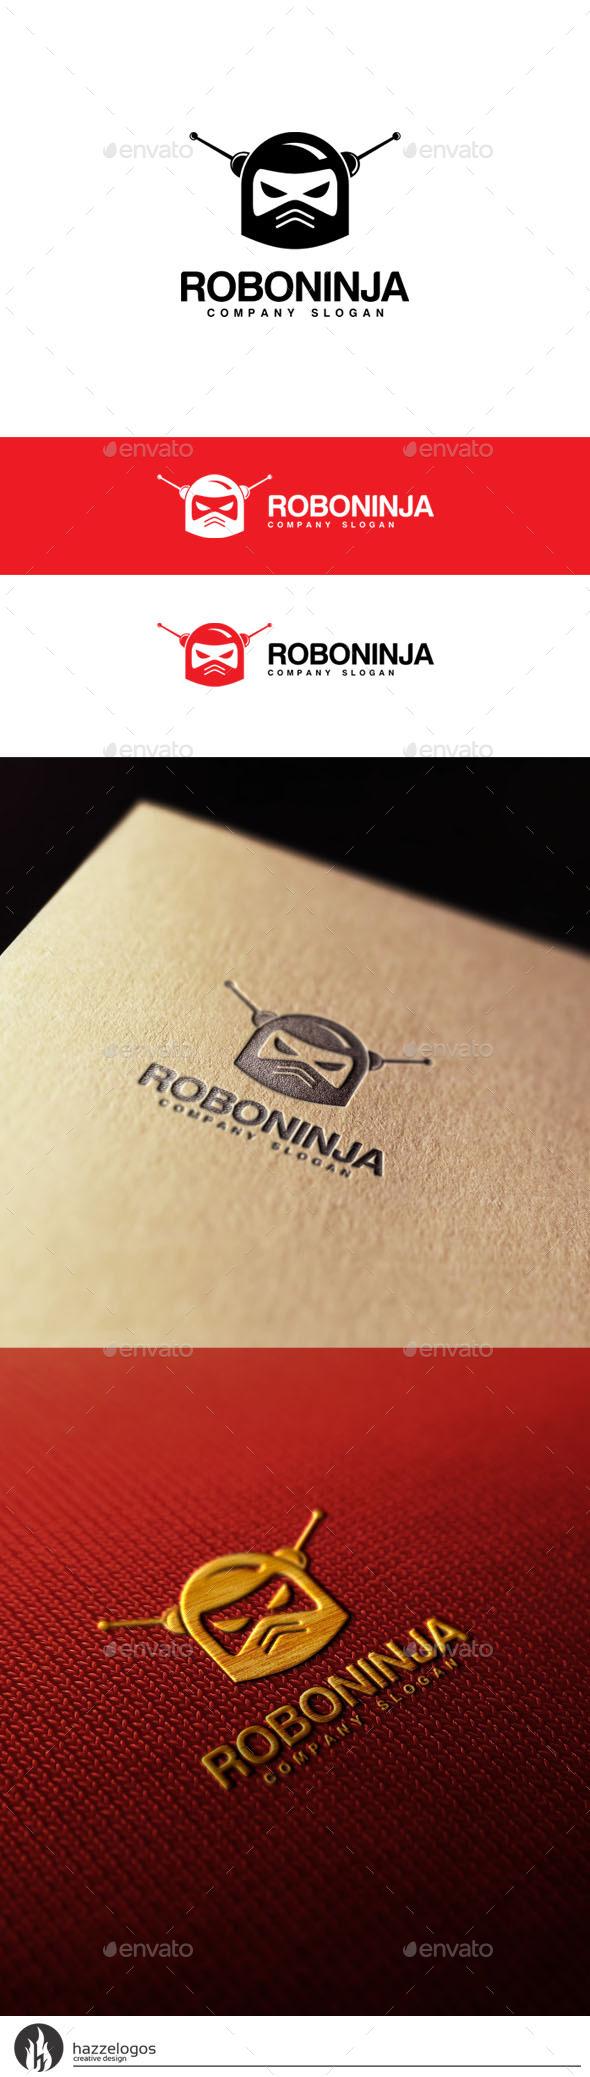 Roboninja Logo